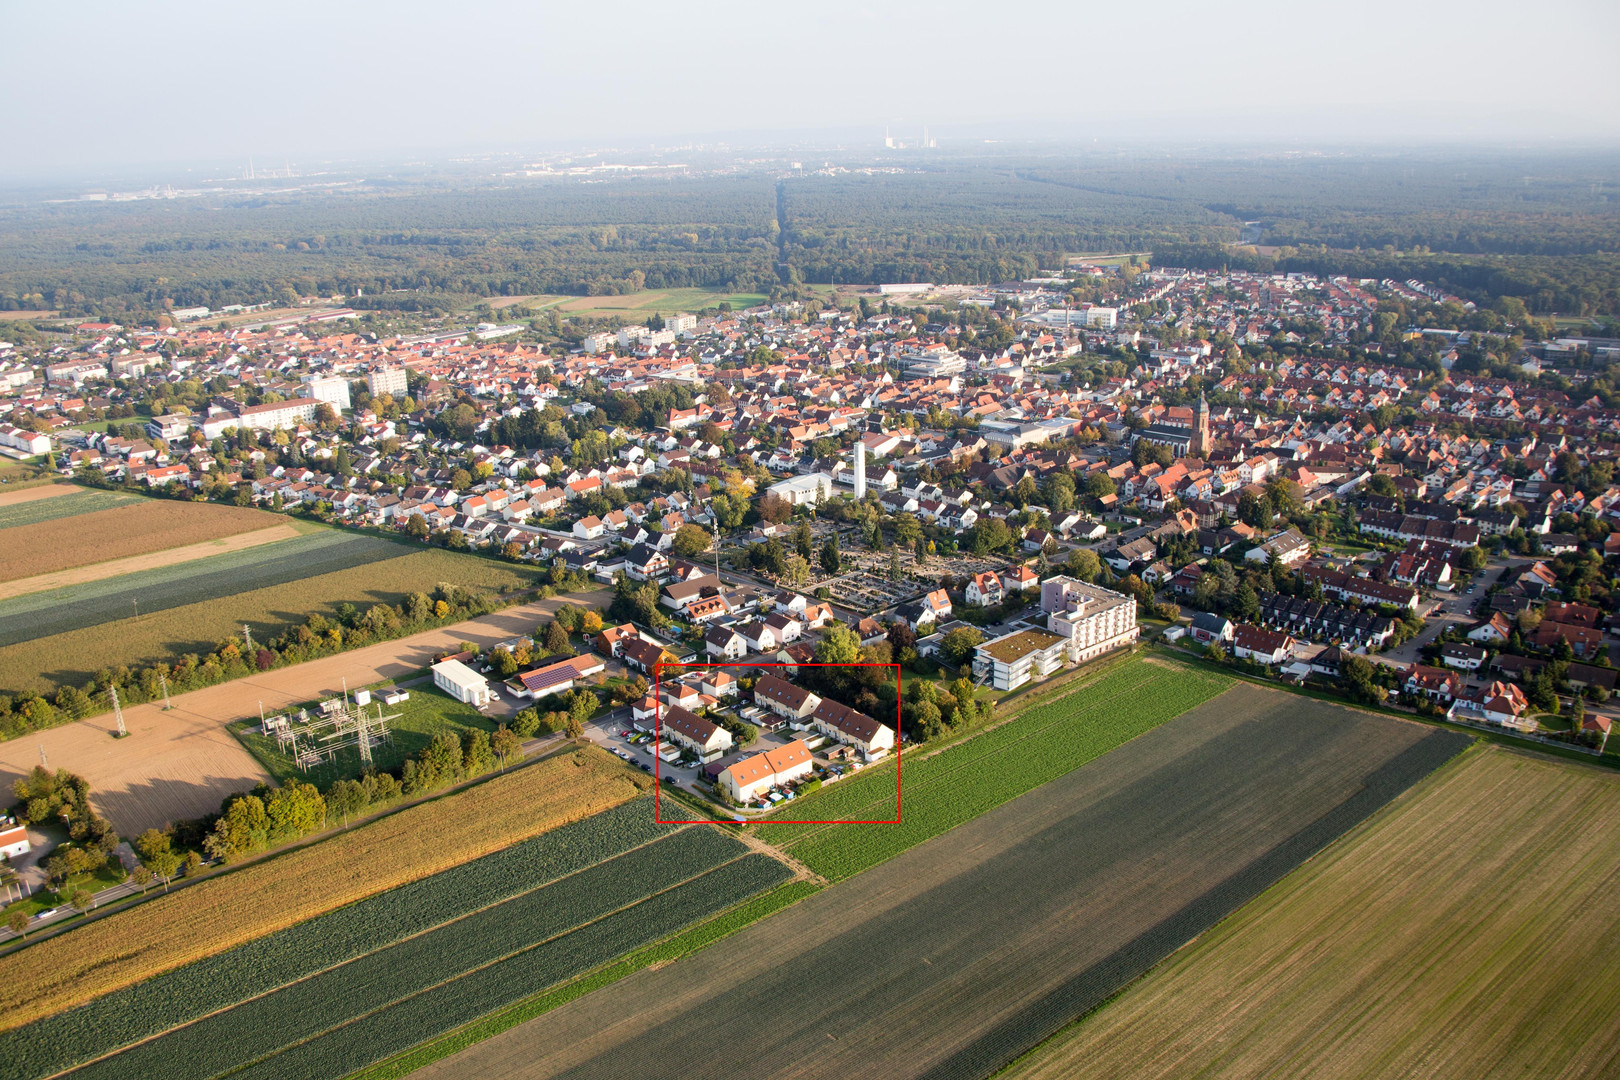 Luftbild Kropsburgstraße, Kandel